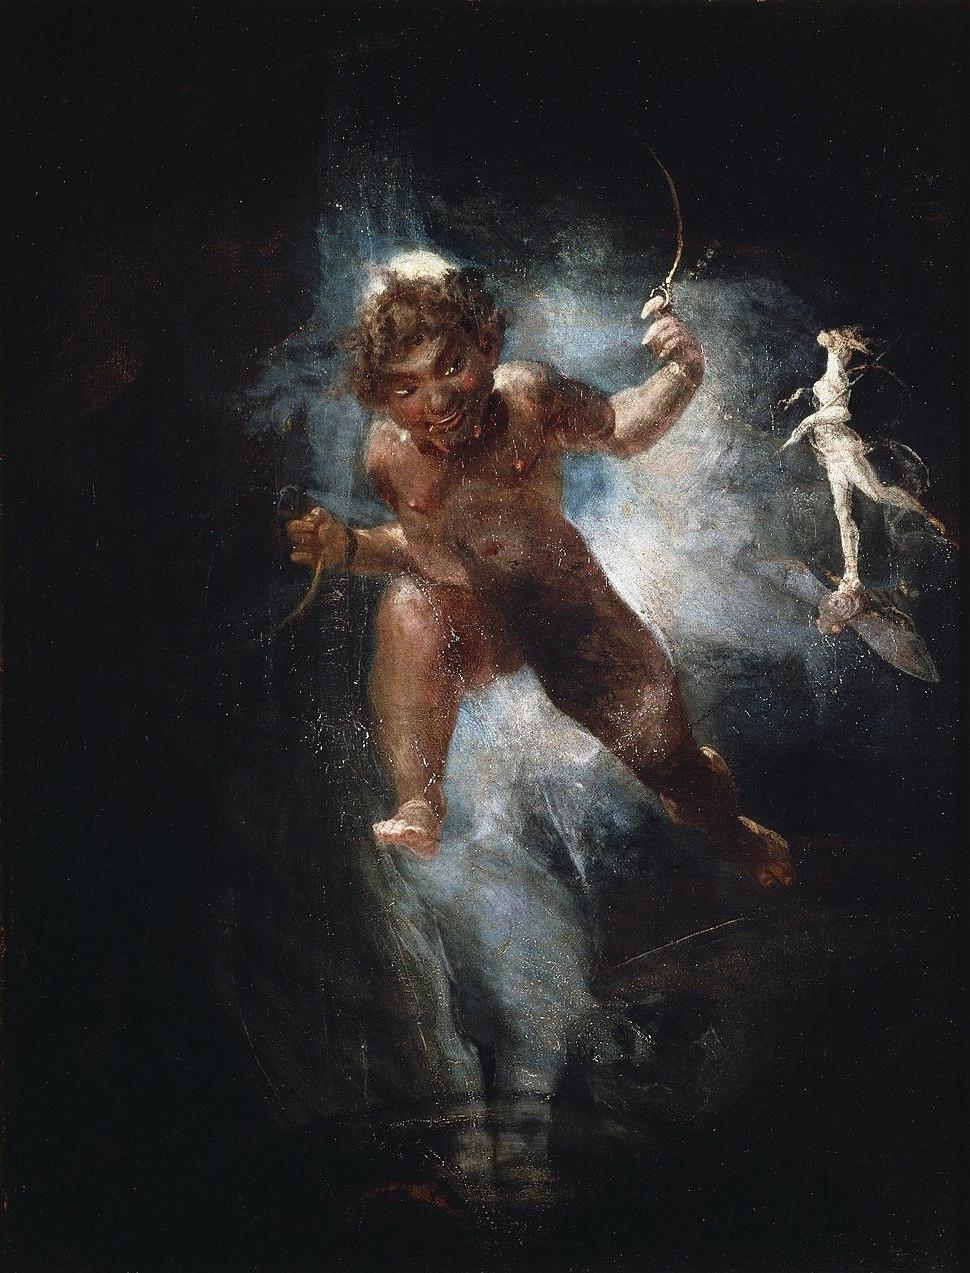 Puck (Fuseli, 1810-1820)